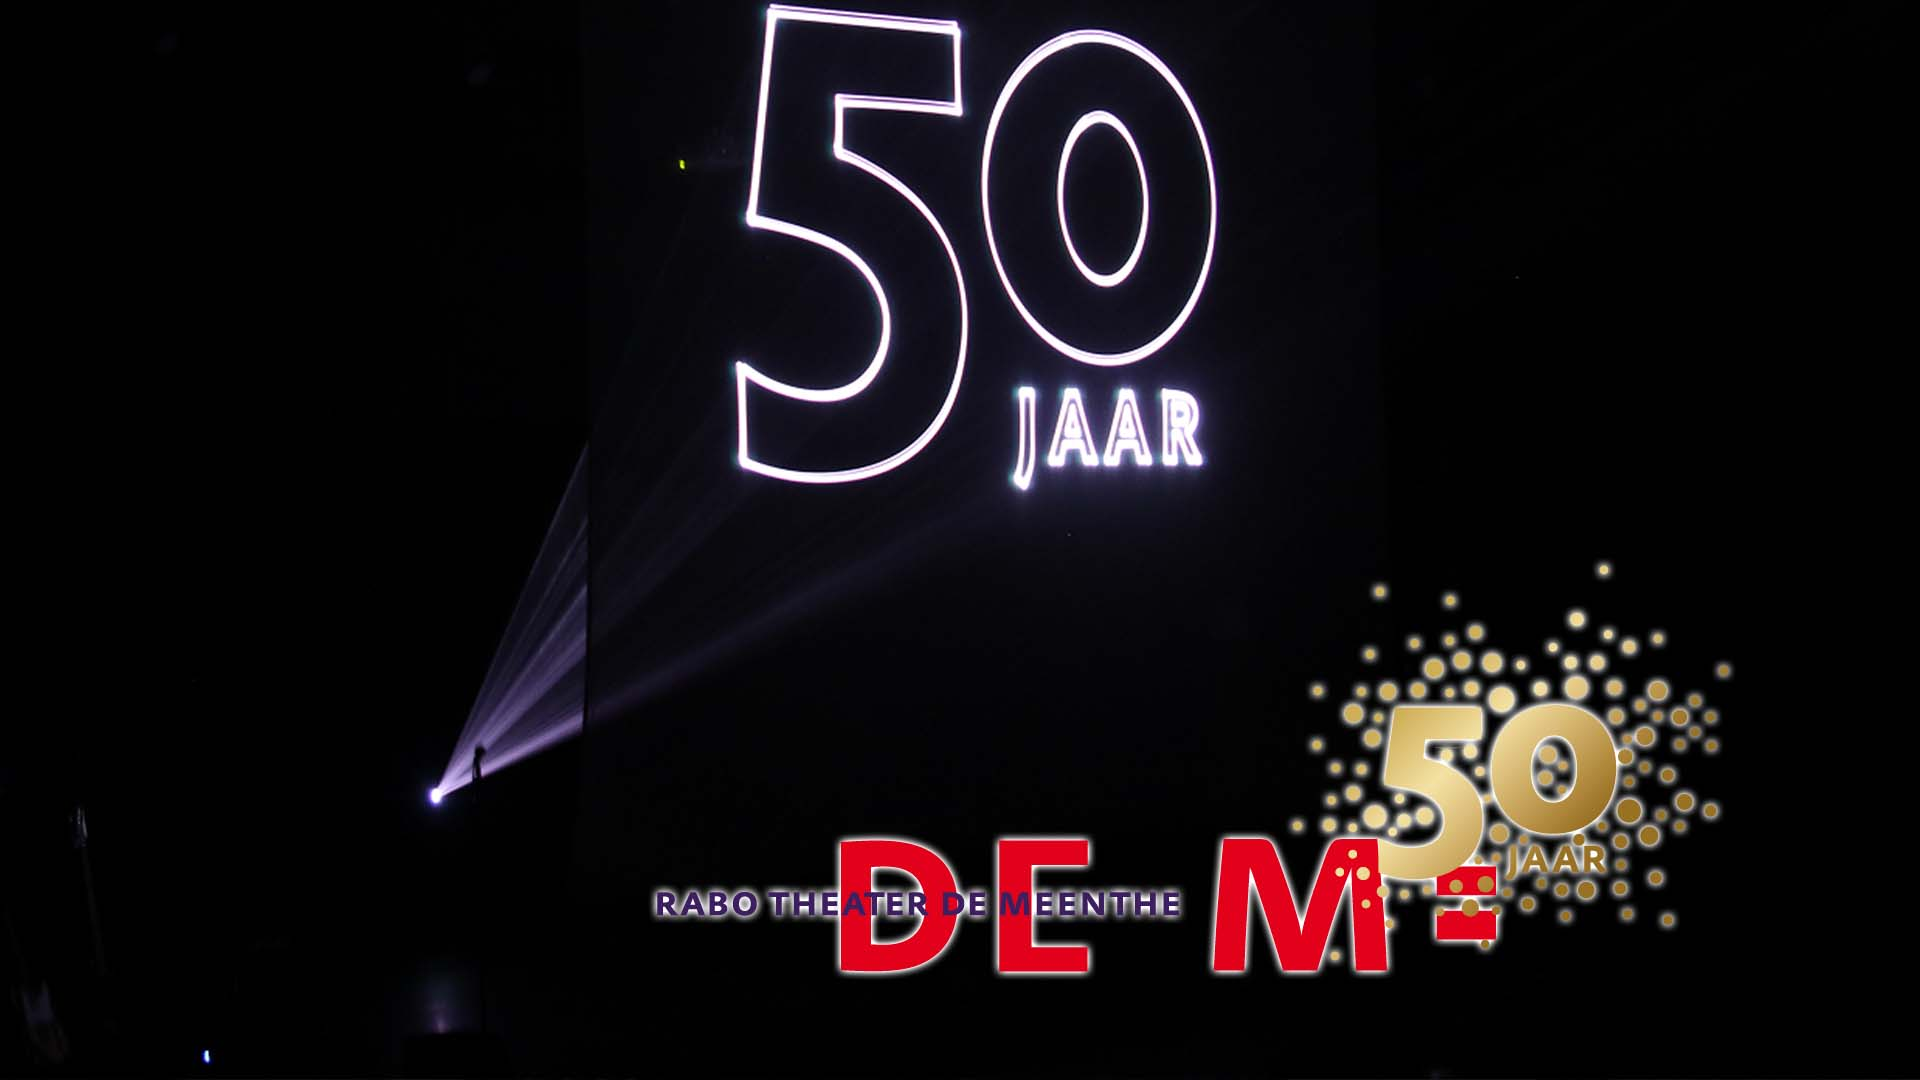 Jubileumfeest De Meenthe fotograaf Freek Dolstra